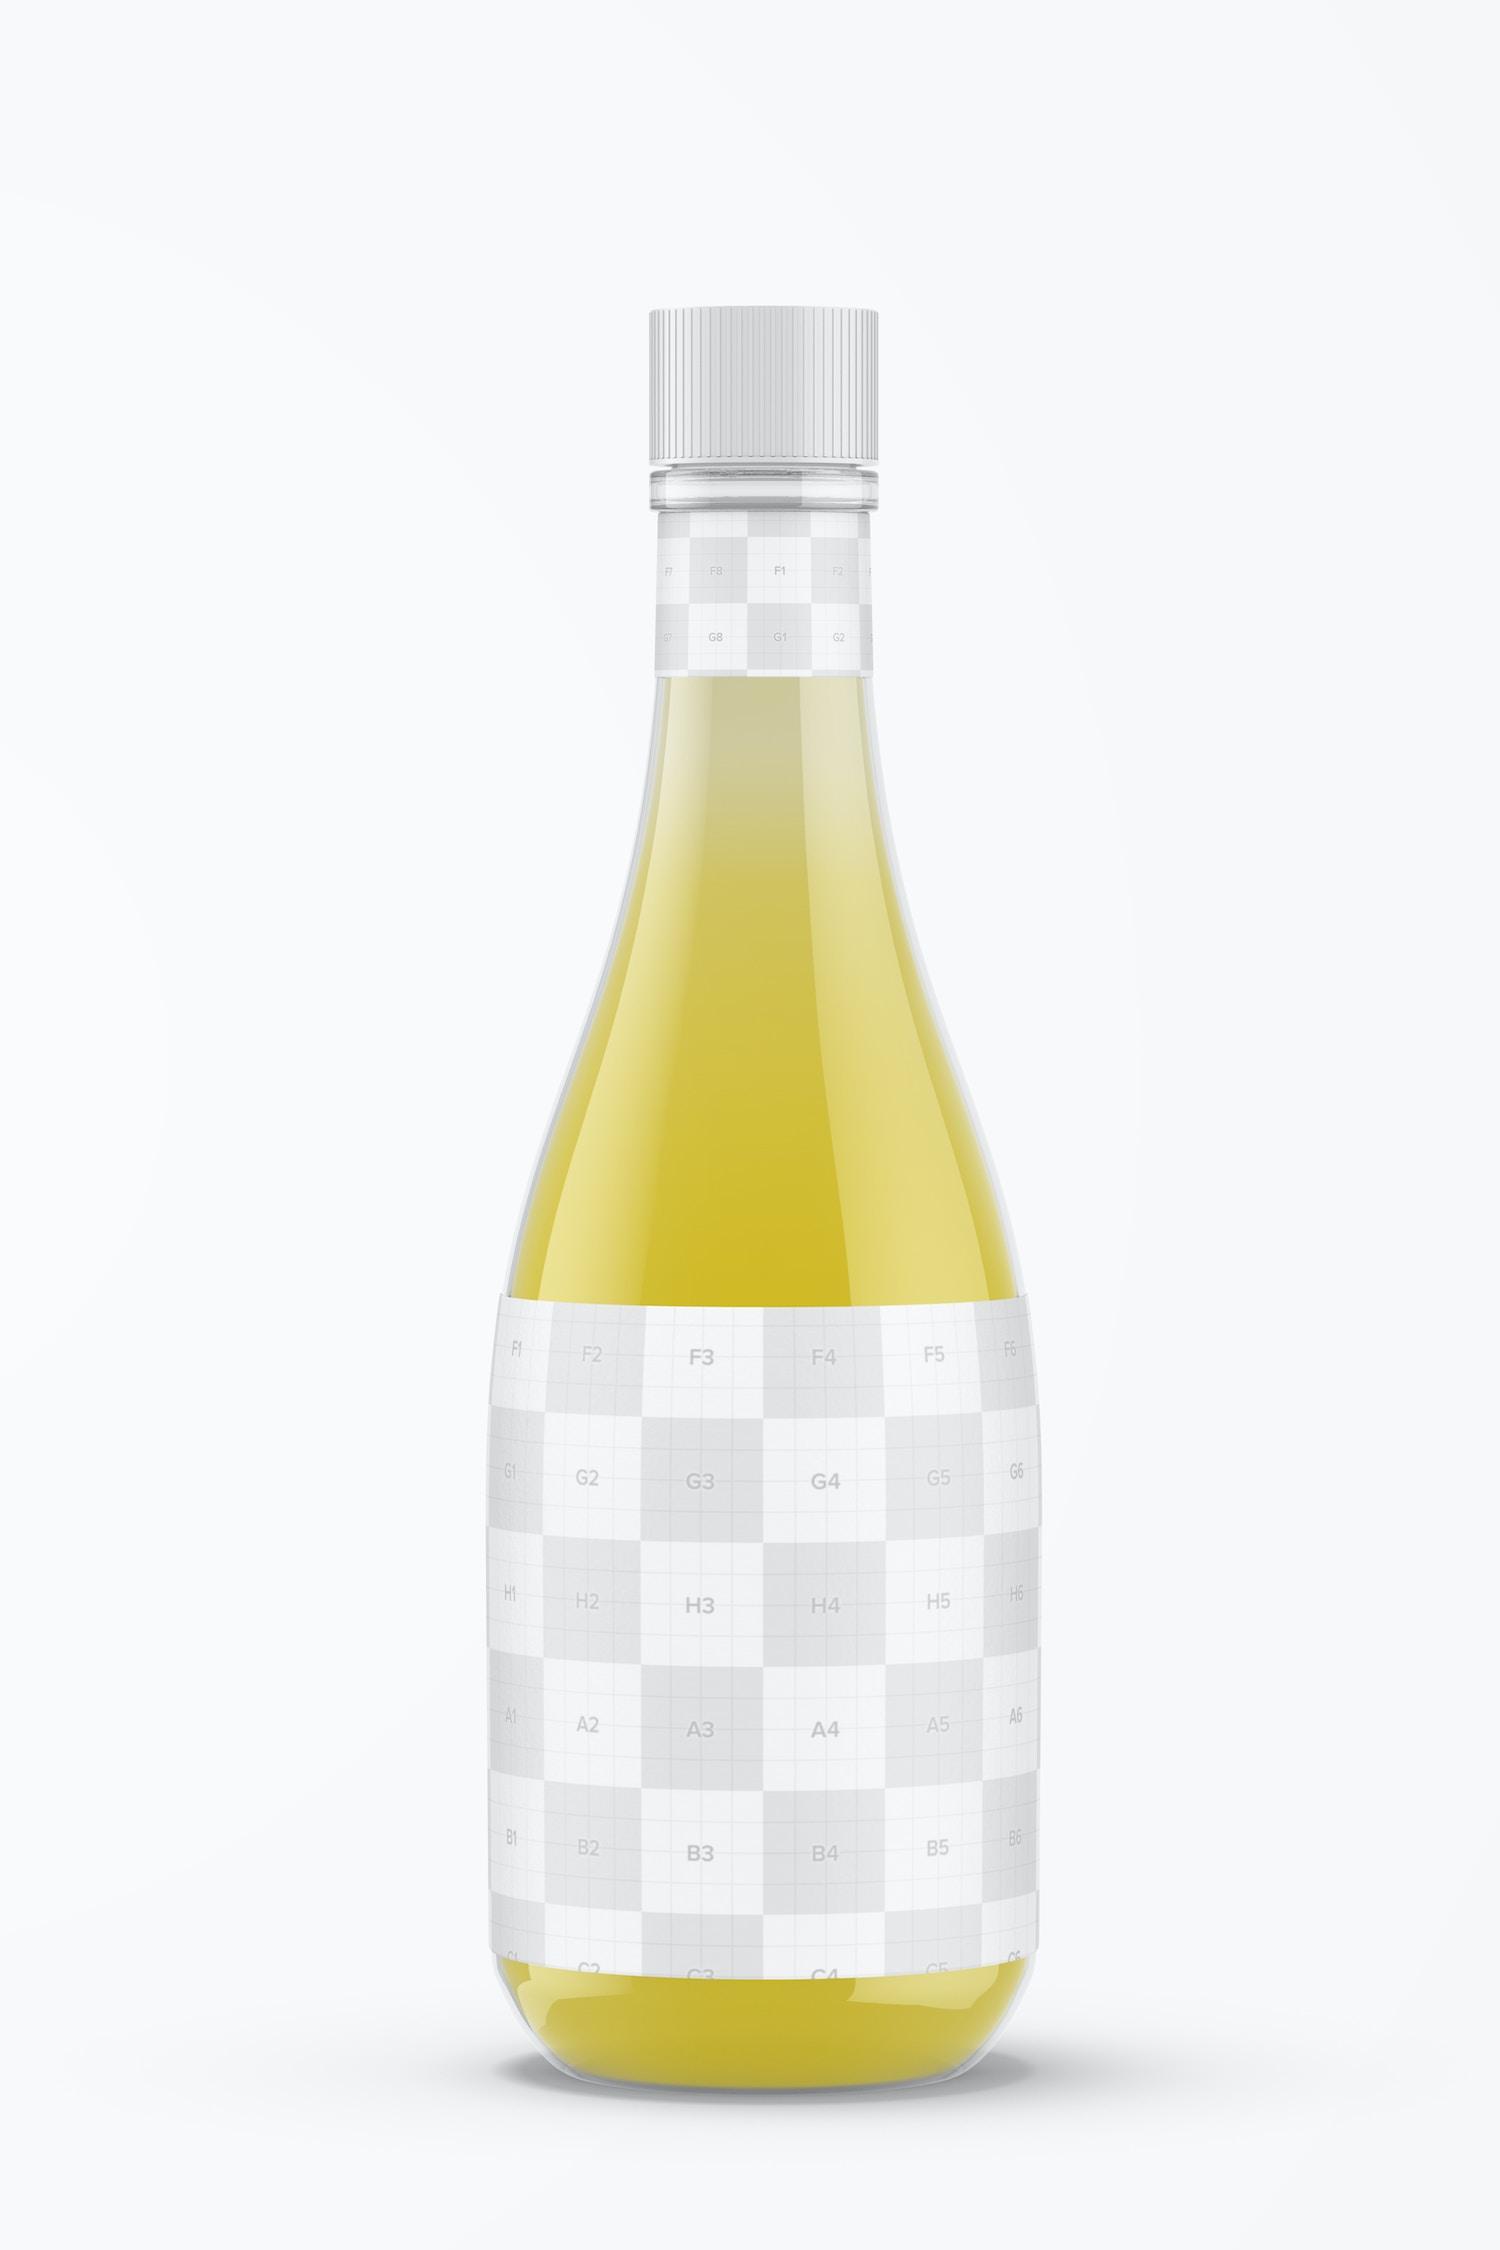 14.5 oz Lemon Vinaigrette Bottle Mockup, Front View